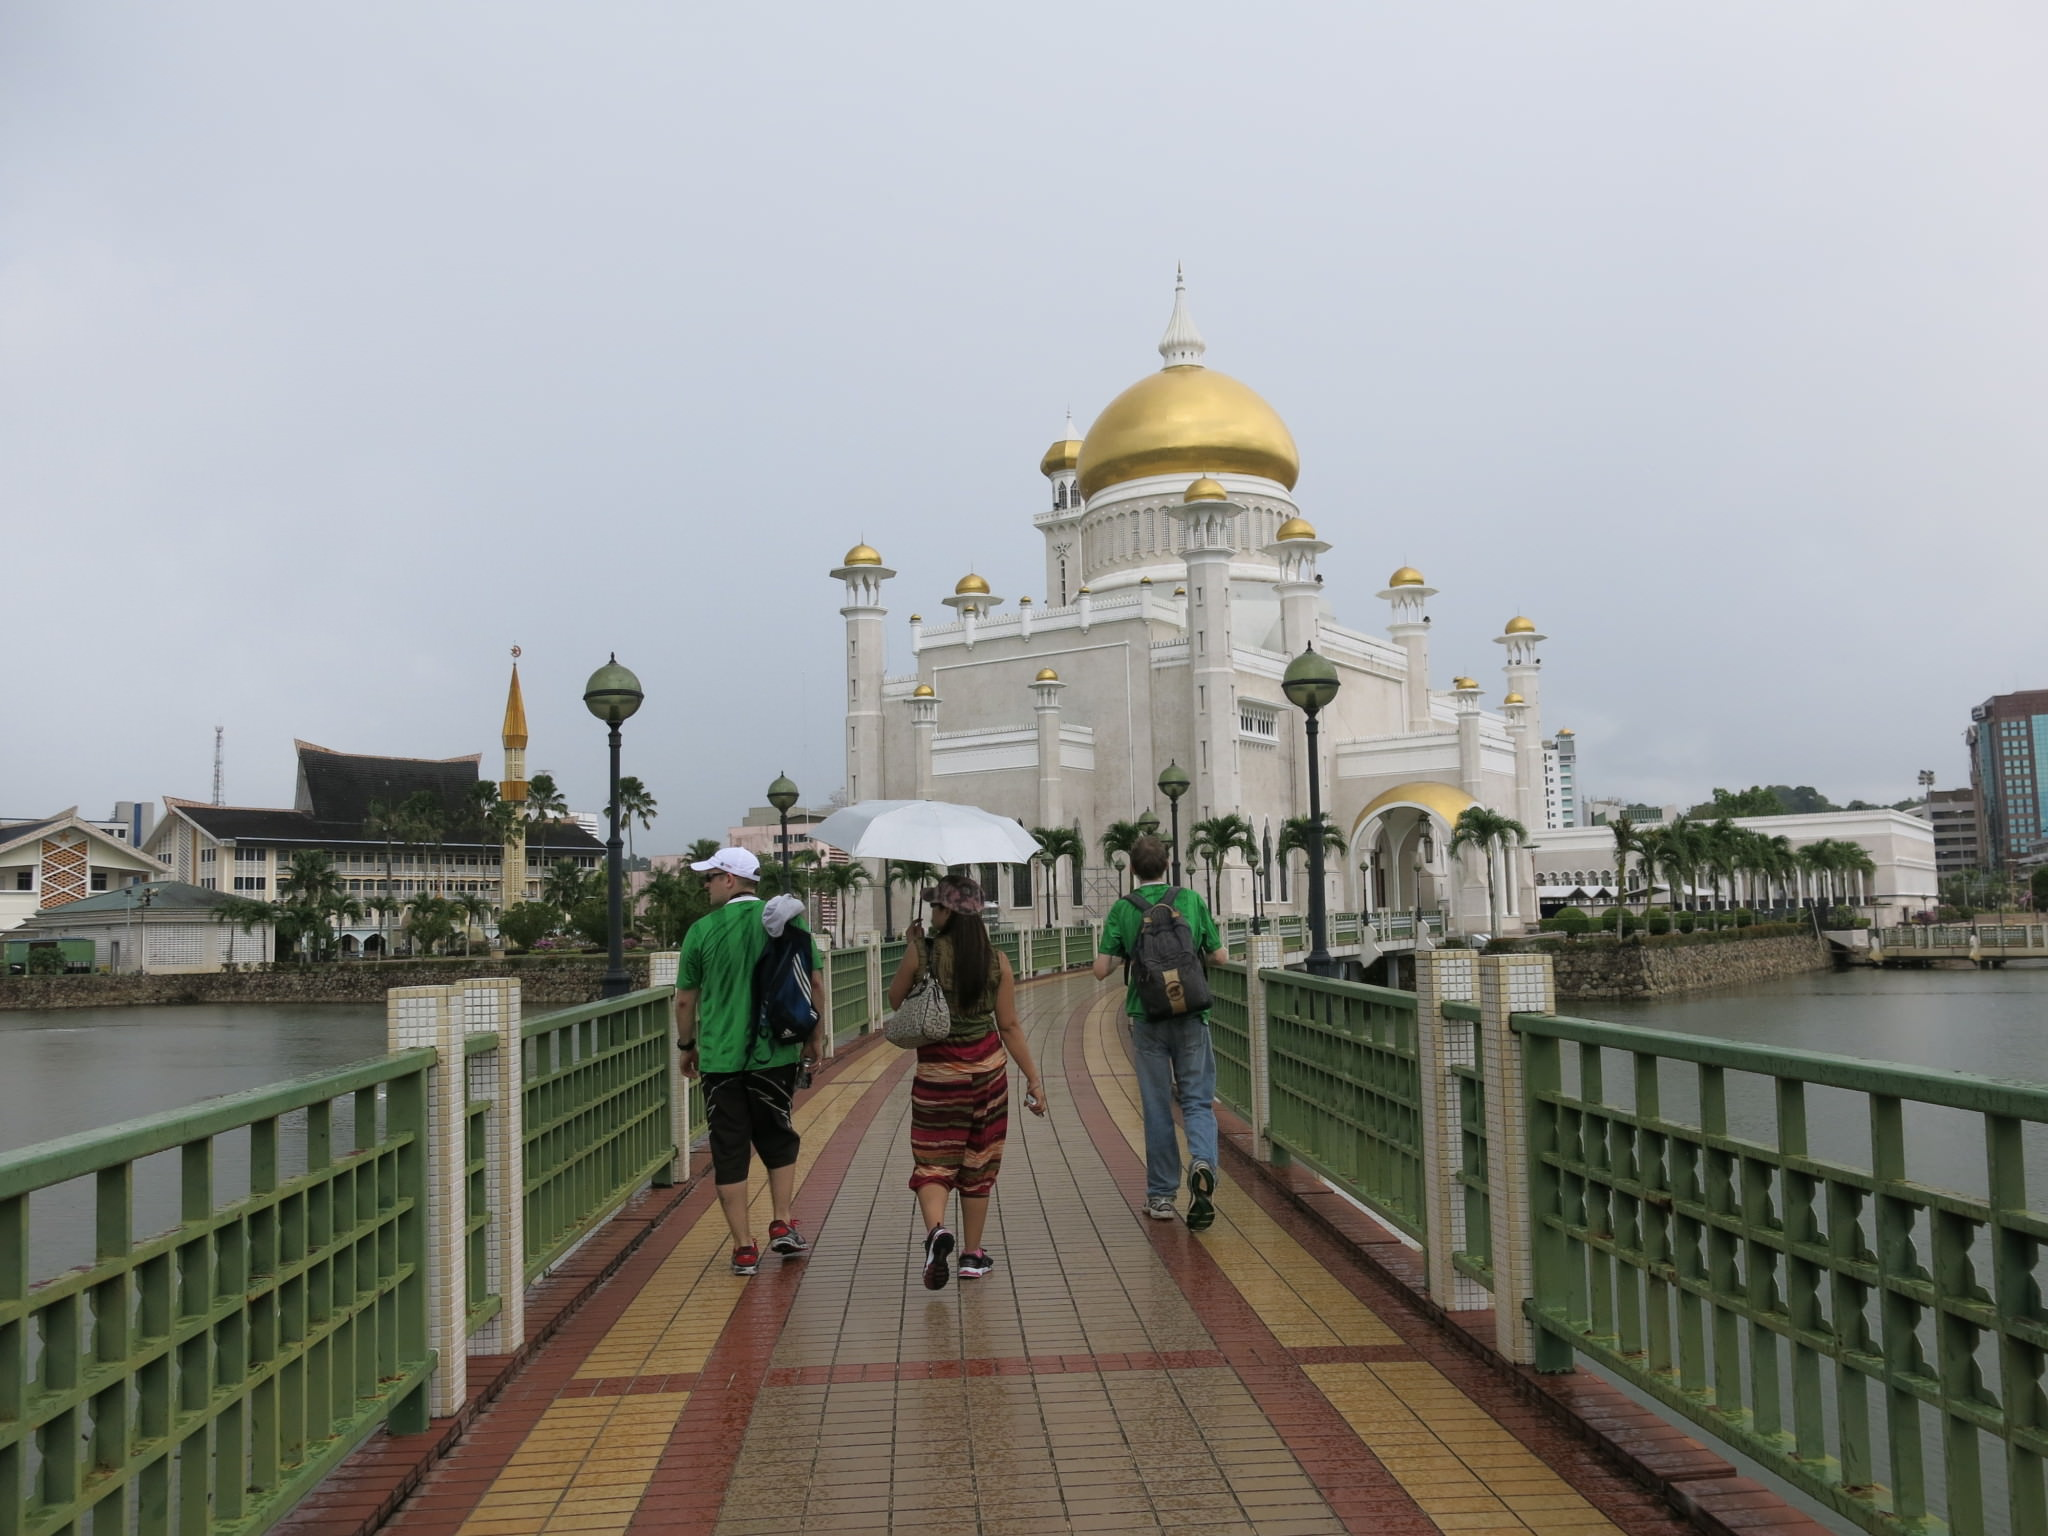 Brunei Darussalam Travel Pictures: Bandar Seri Begawan ...  |Bandar Seri Begawan Brunei Darussalam